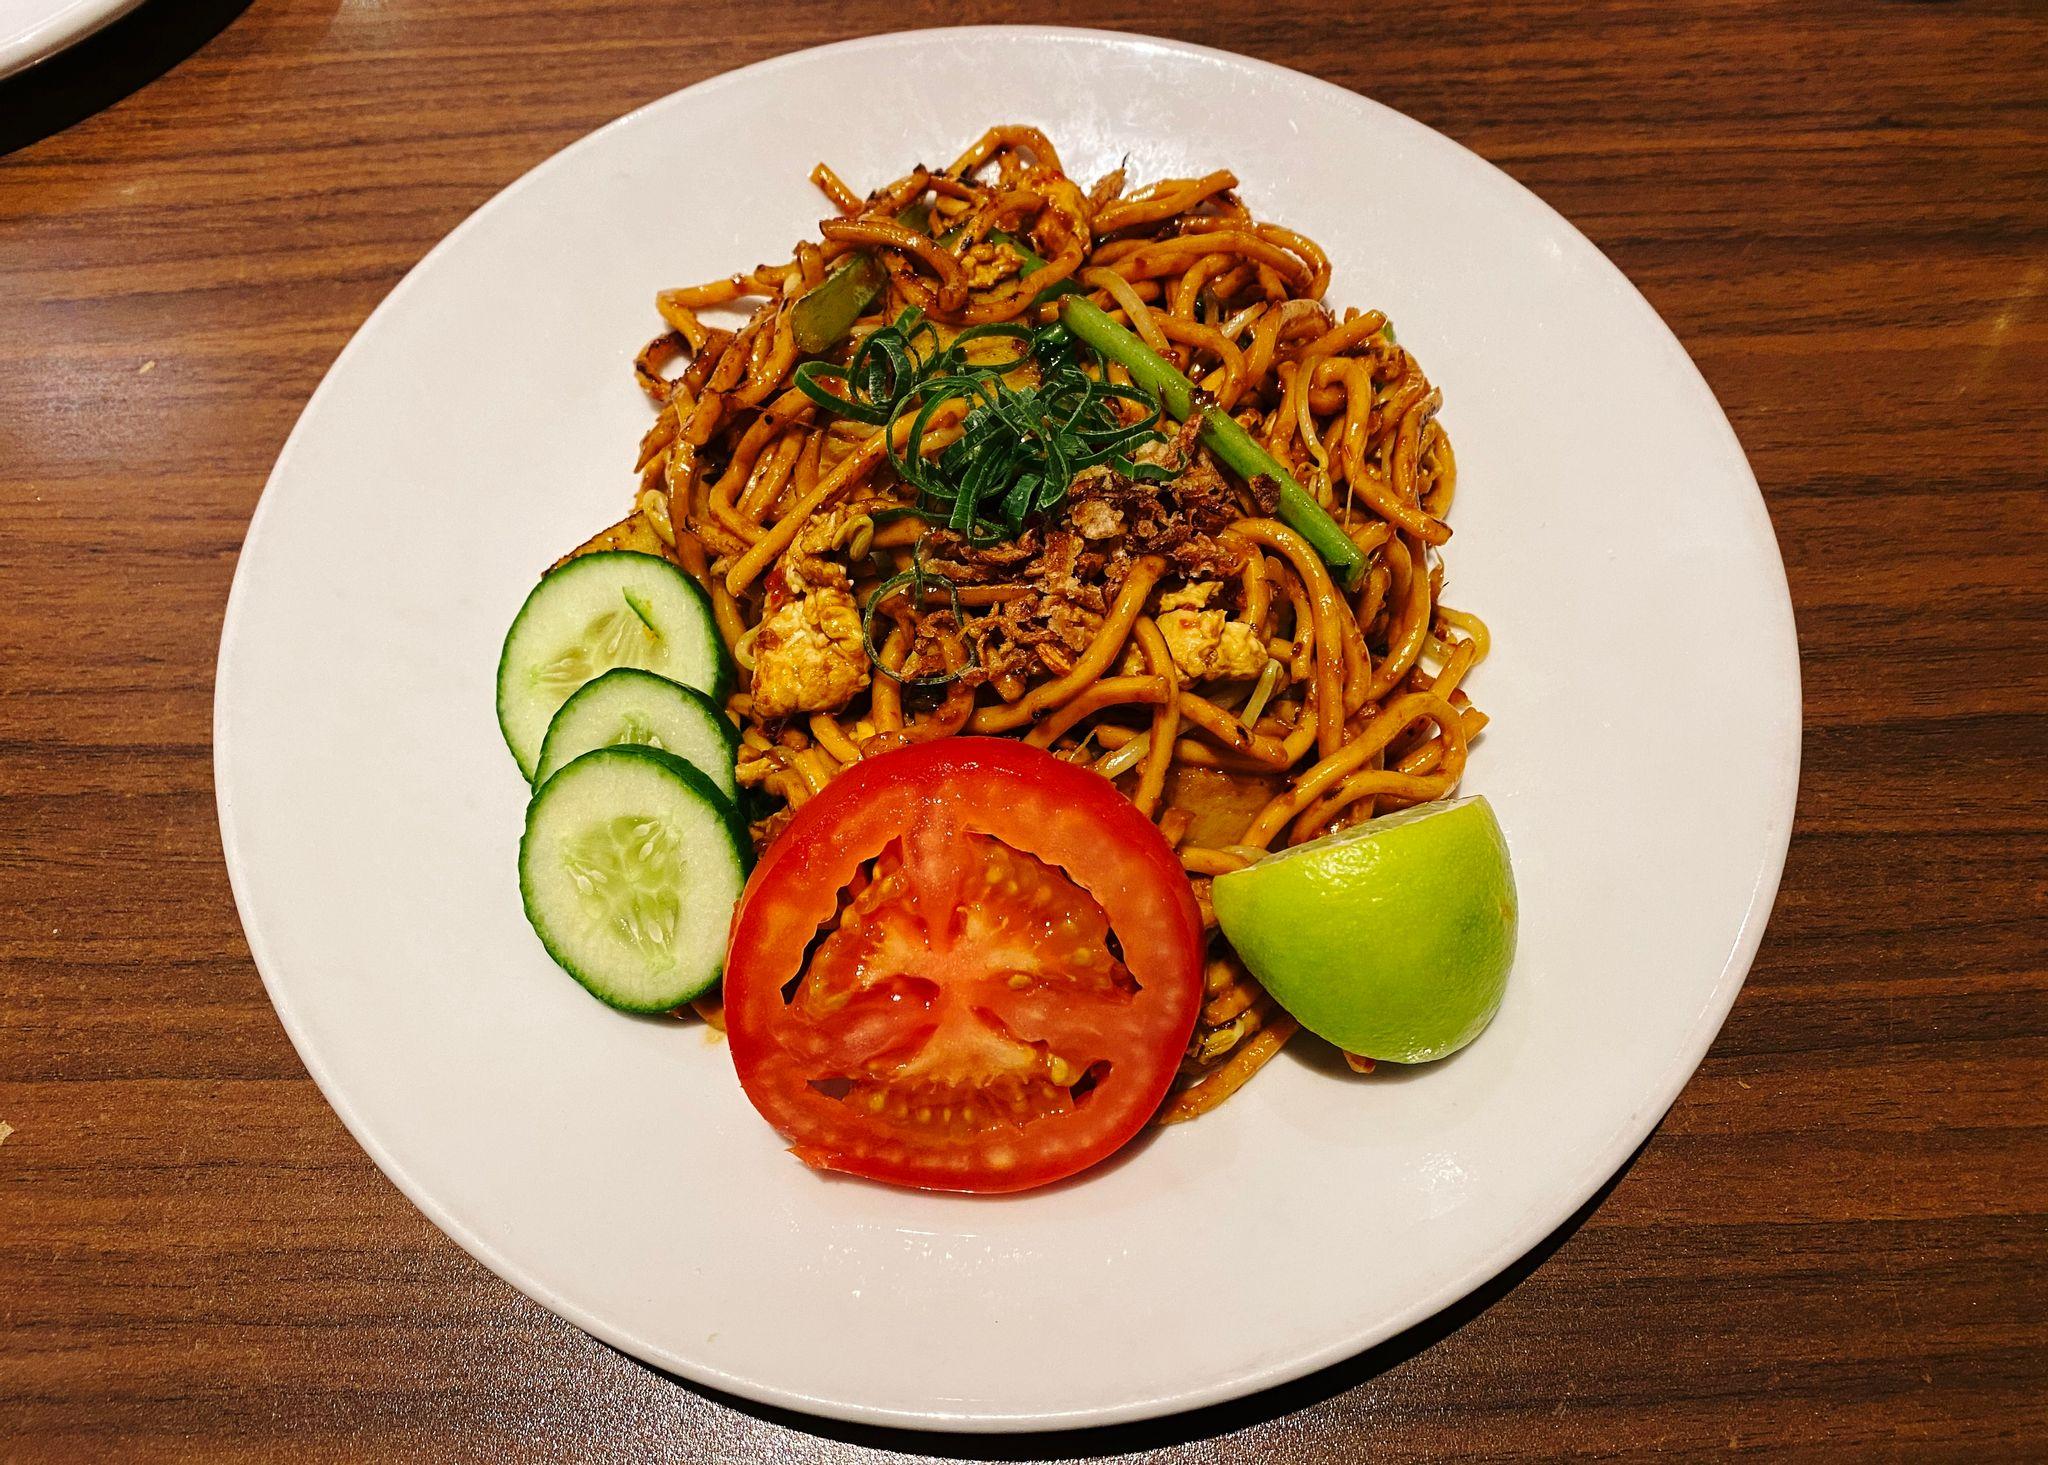 A photo of a plate of mee goreng.